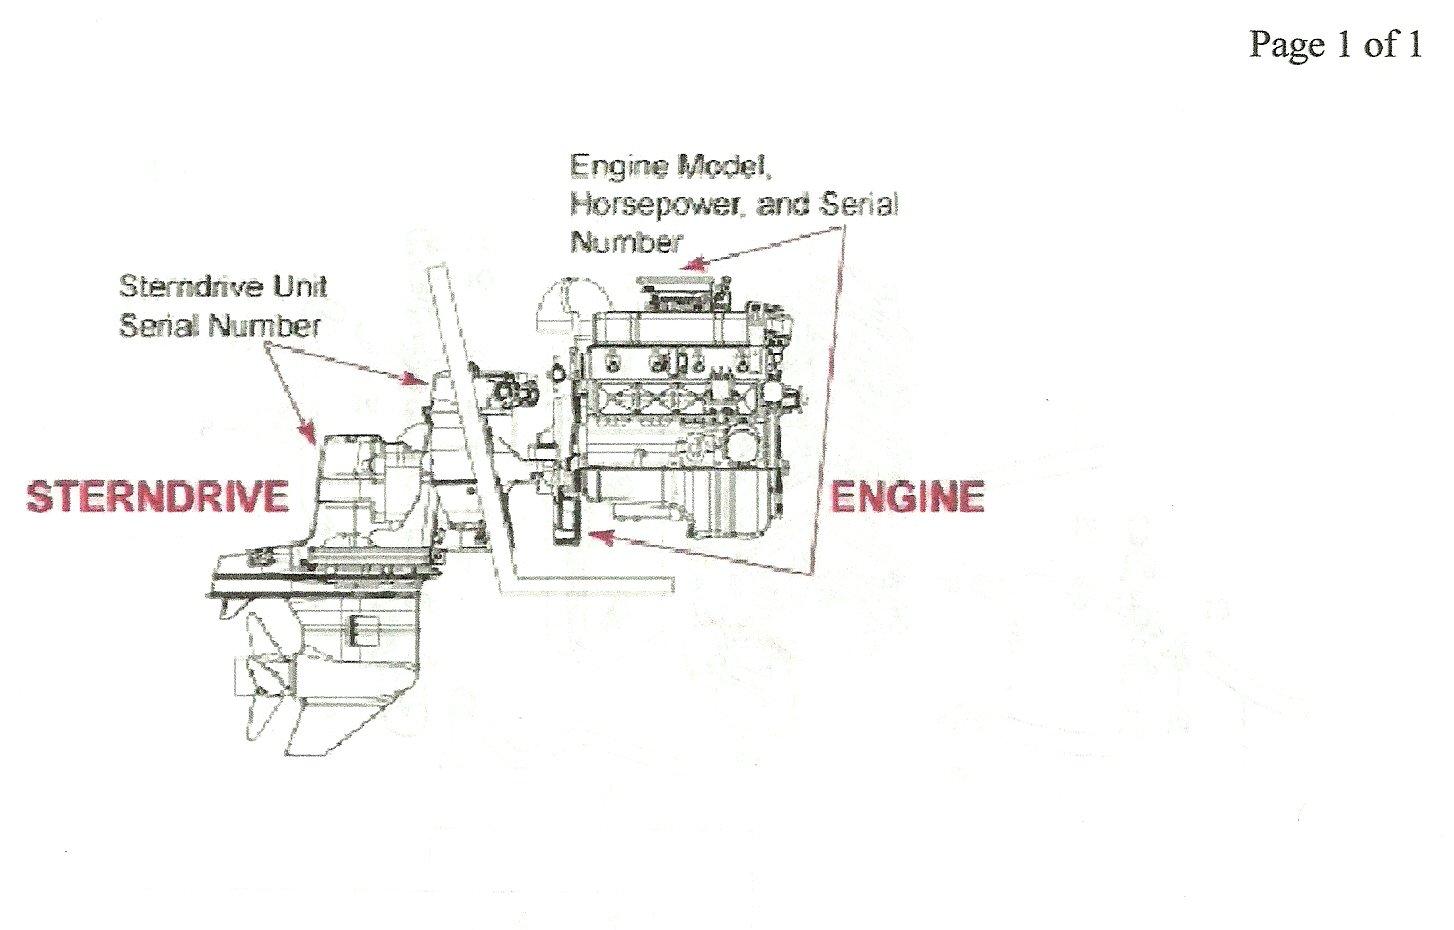 mercruiser 4.3 parts manual